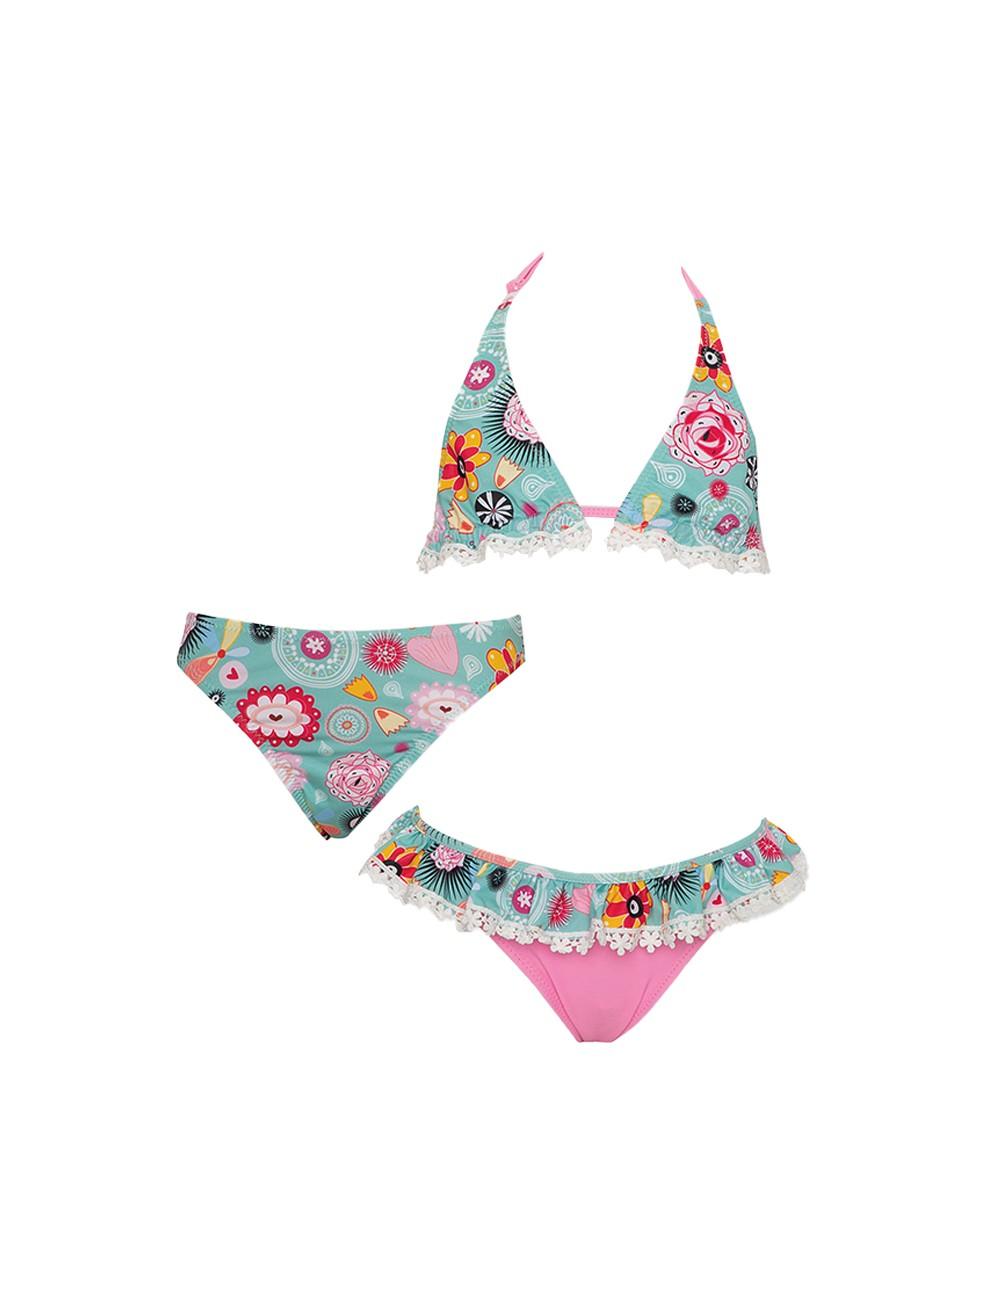 Tortue Παιδικό / Εφηβικό Μαγιό Bikini με 2 Slip S1-045-123 Lamoda.gr